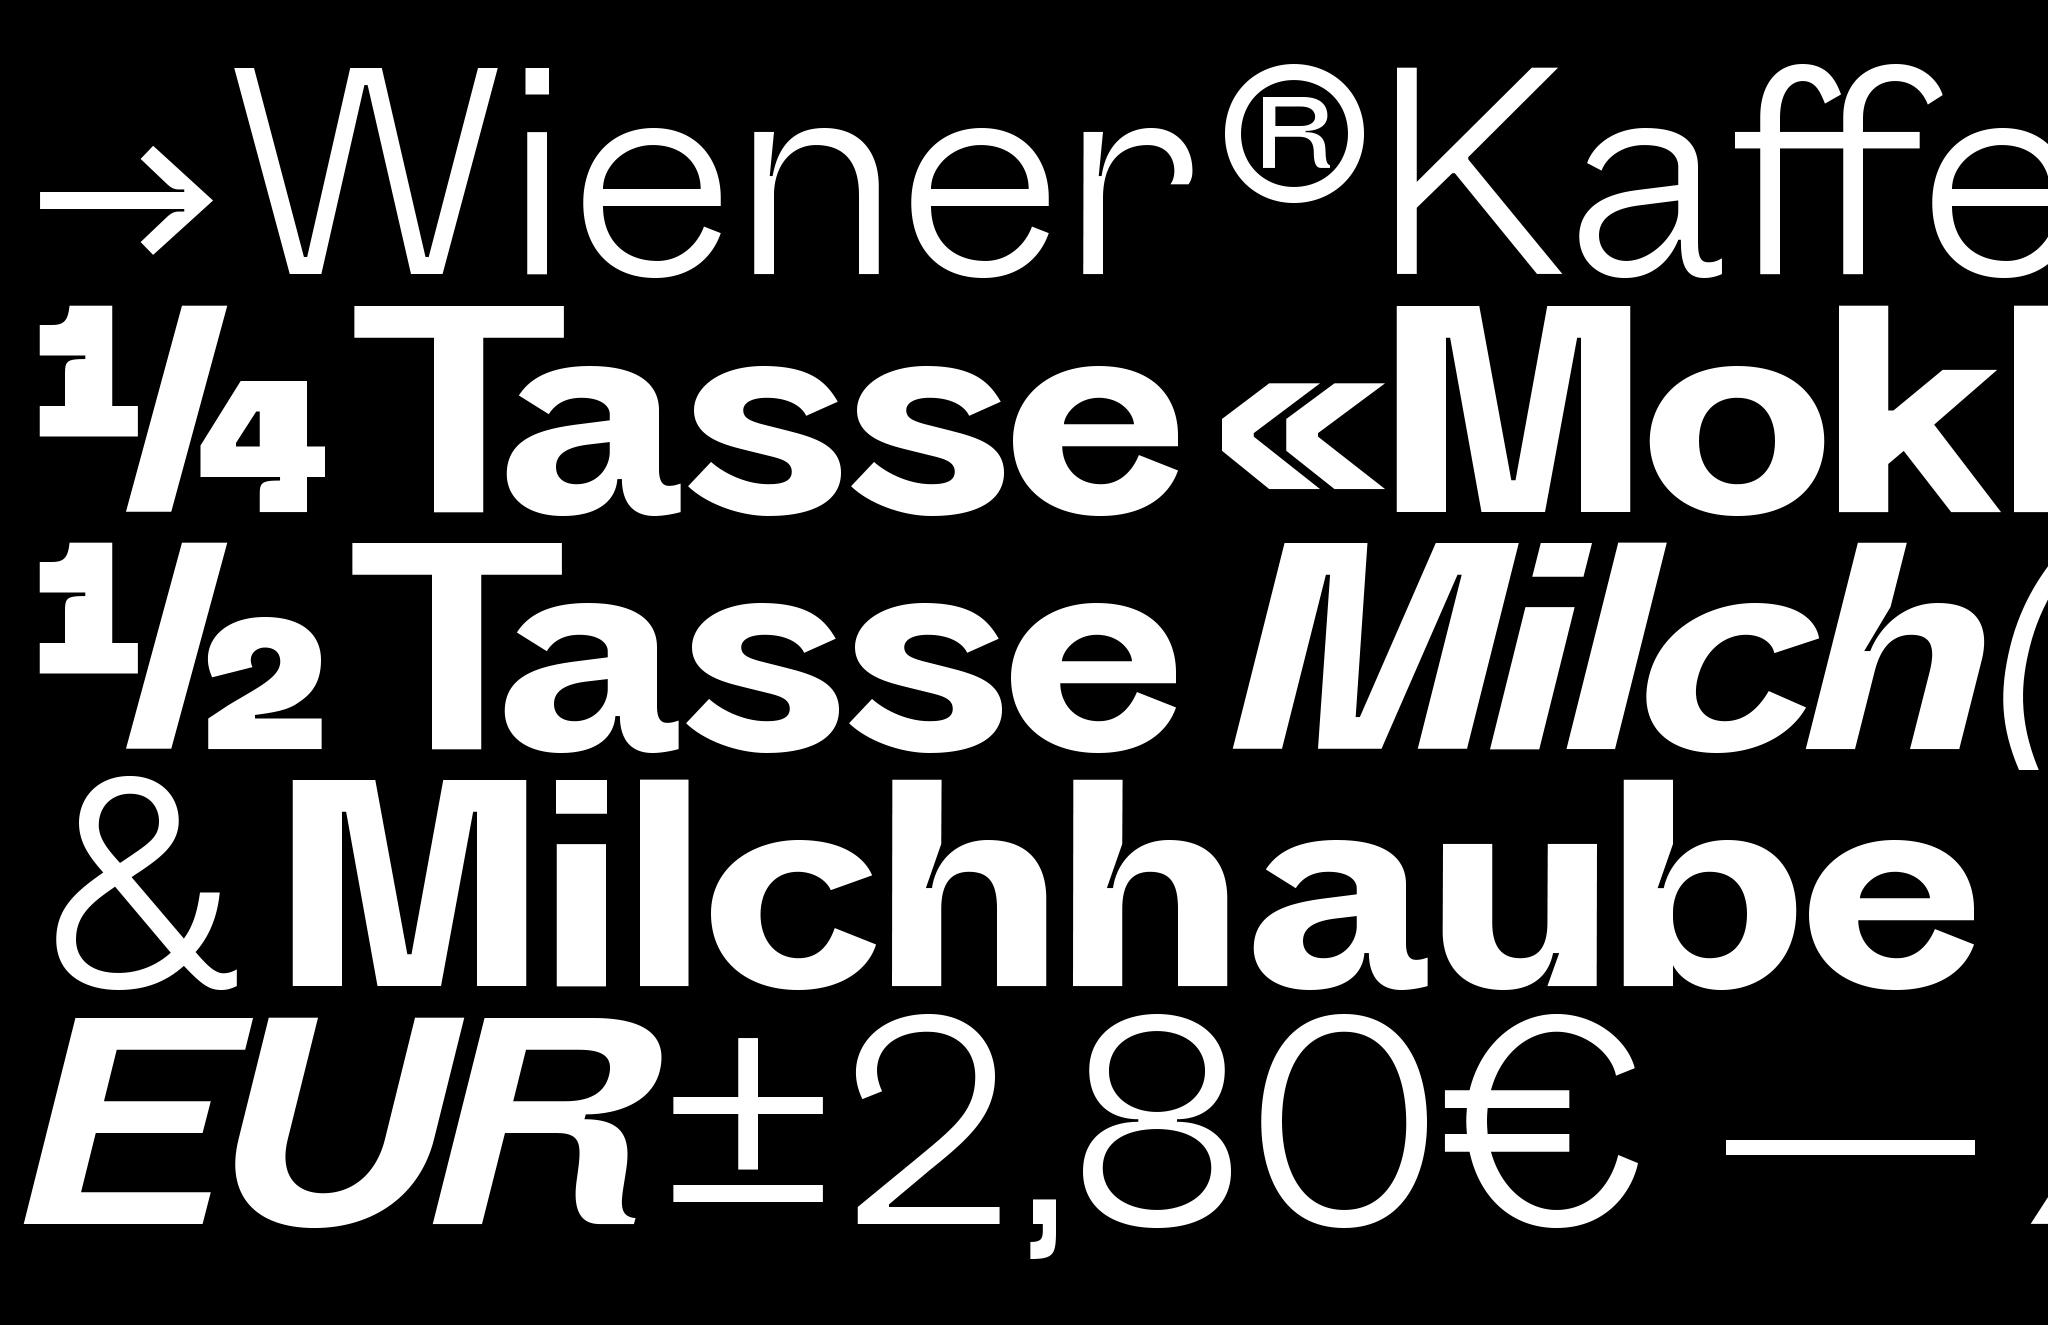 Melange V2.0 & Italic Glyhps Showing